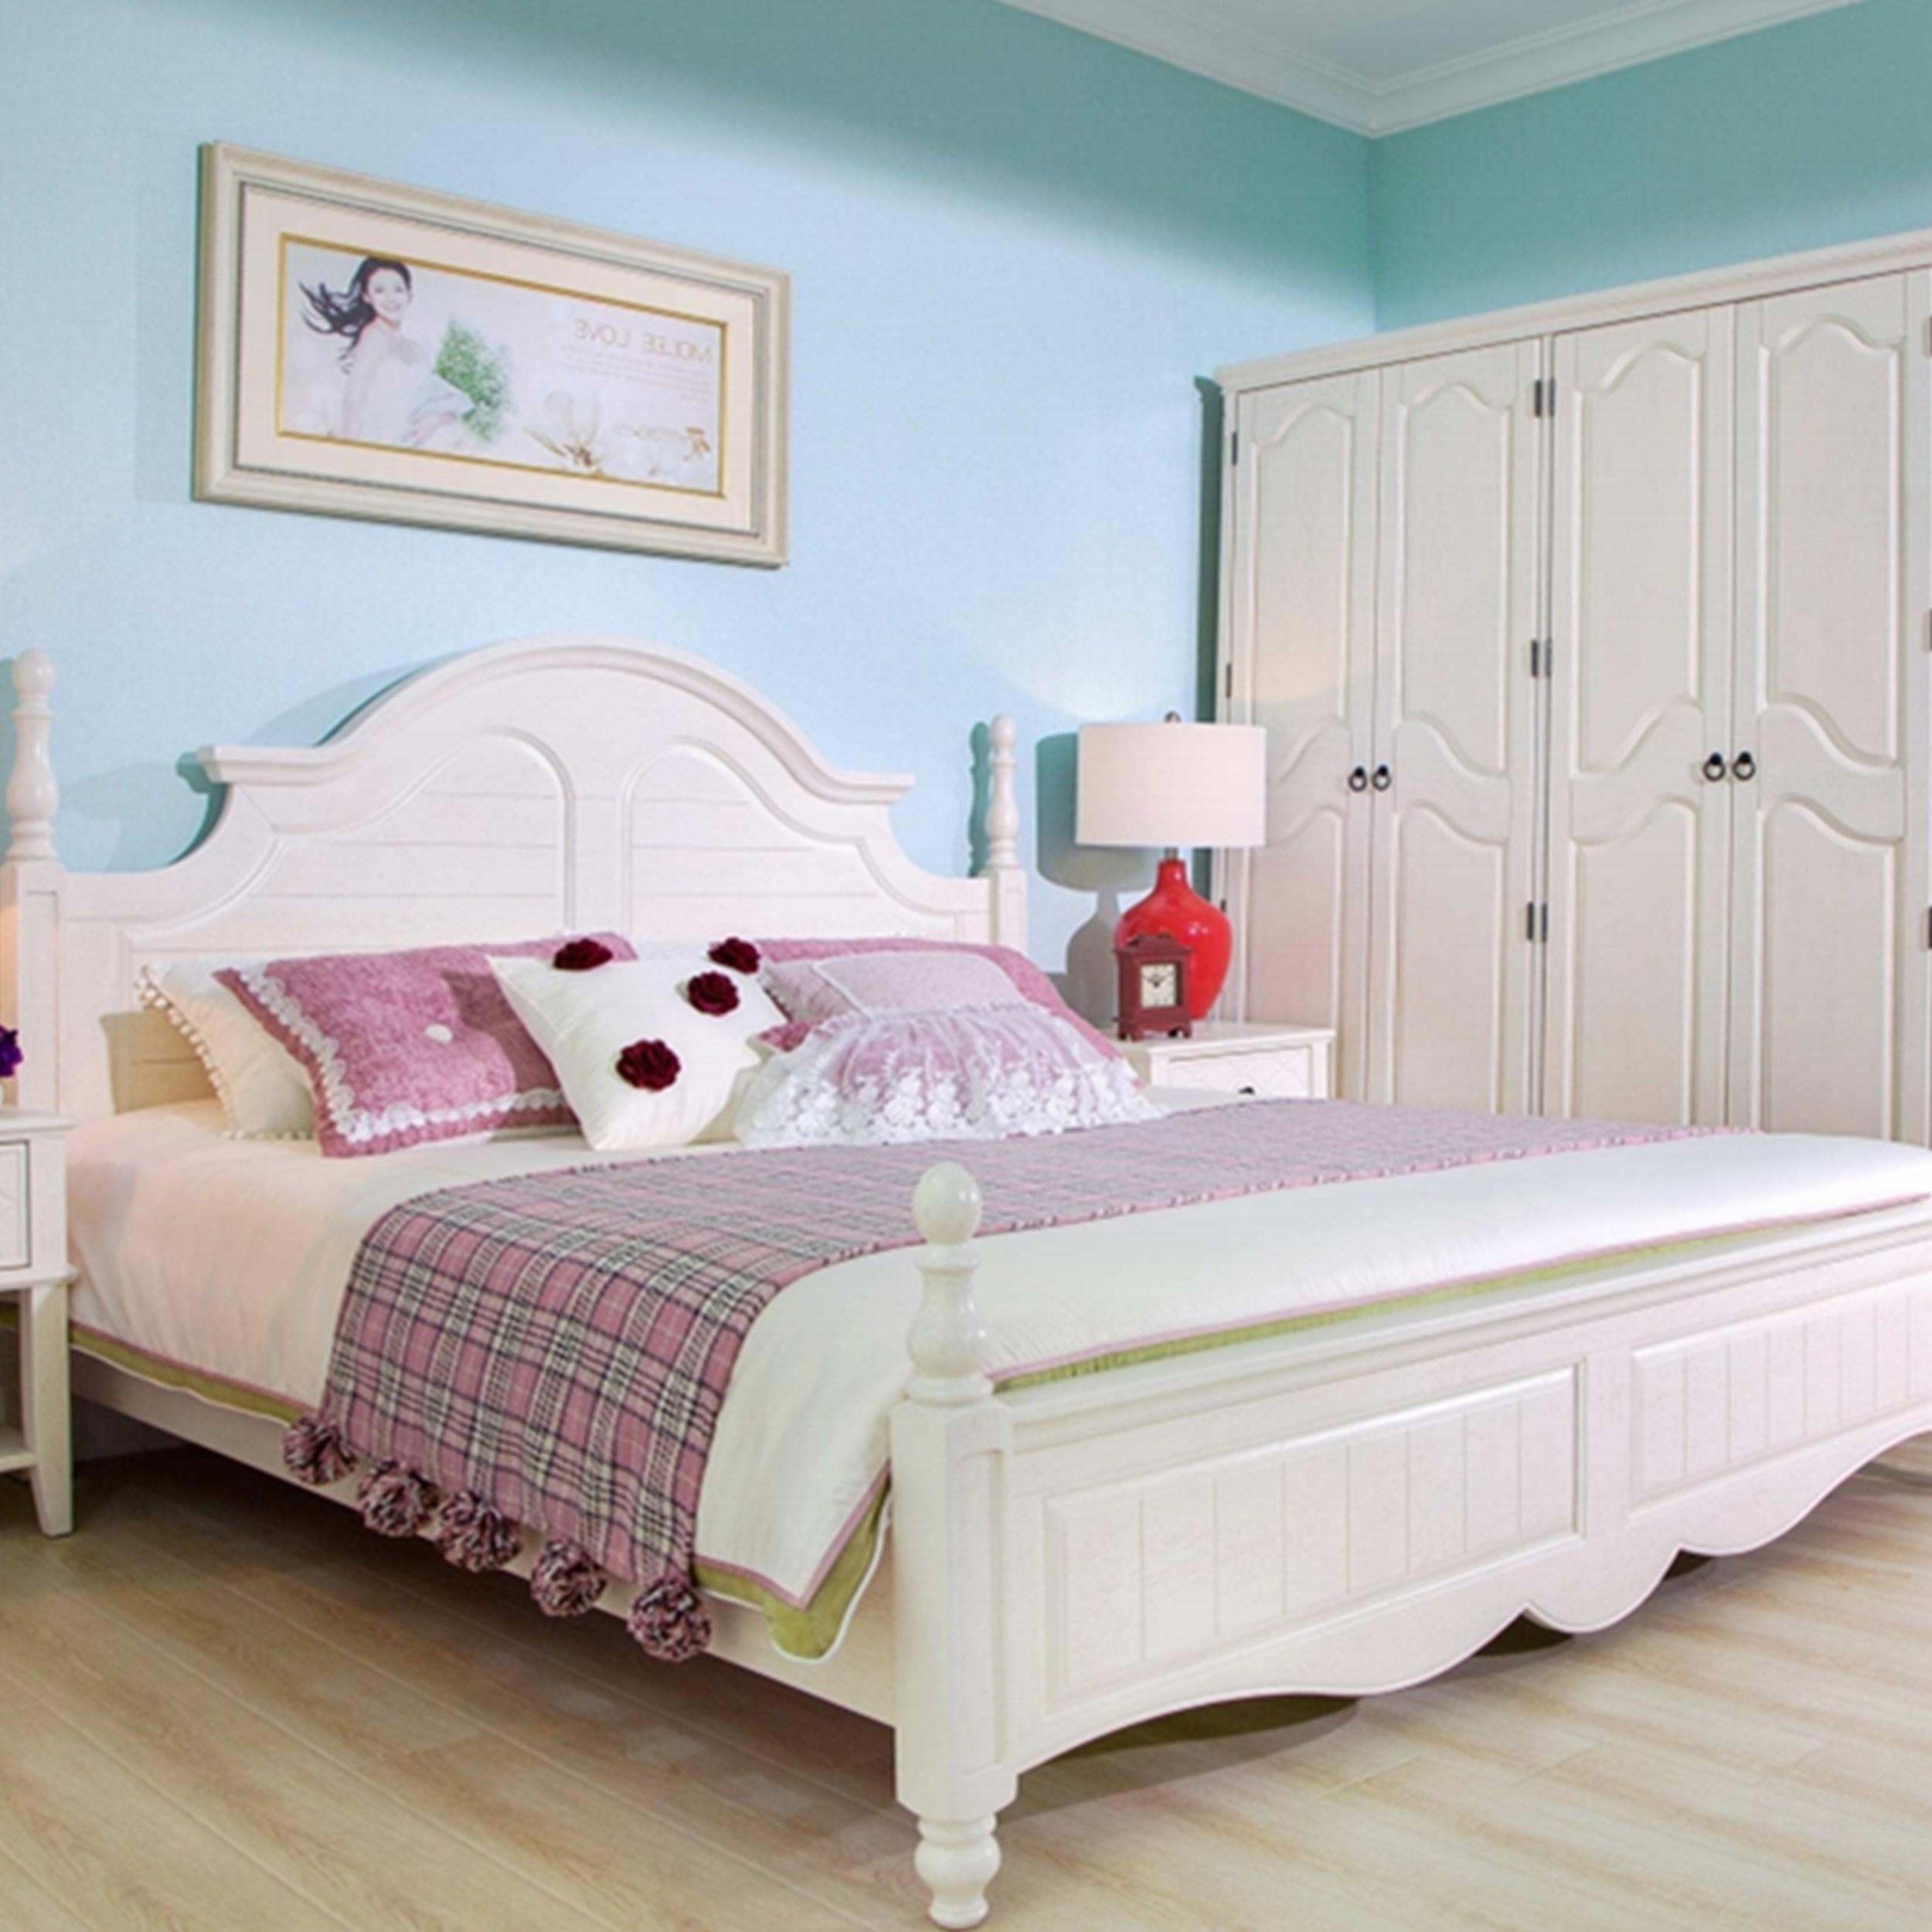 Pine Wood Bedroom Furniture Sets Suite Furniture High End Solid Wood  Bedroom Sets Furnitures - Buy Bedroom Furniture,High End Solid Wood Bedroom  Sets ...